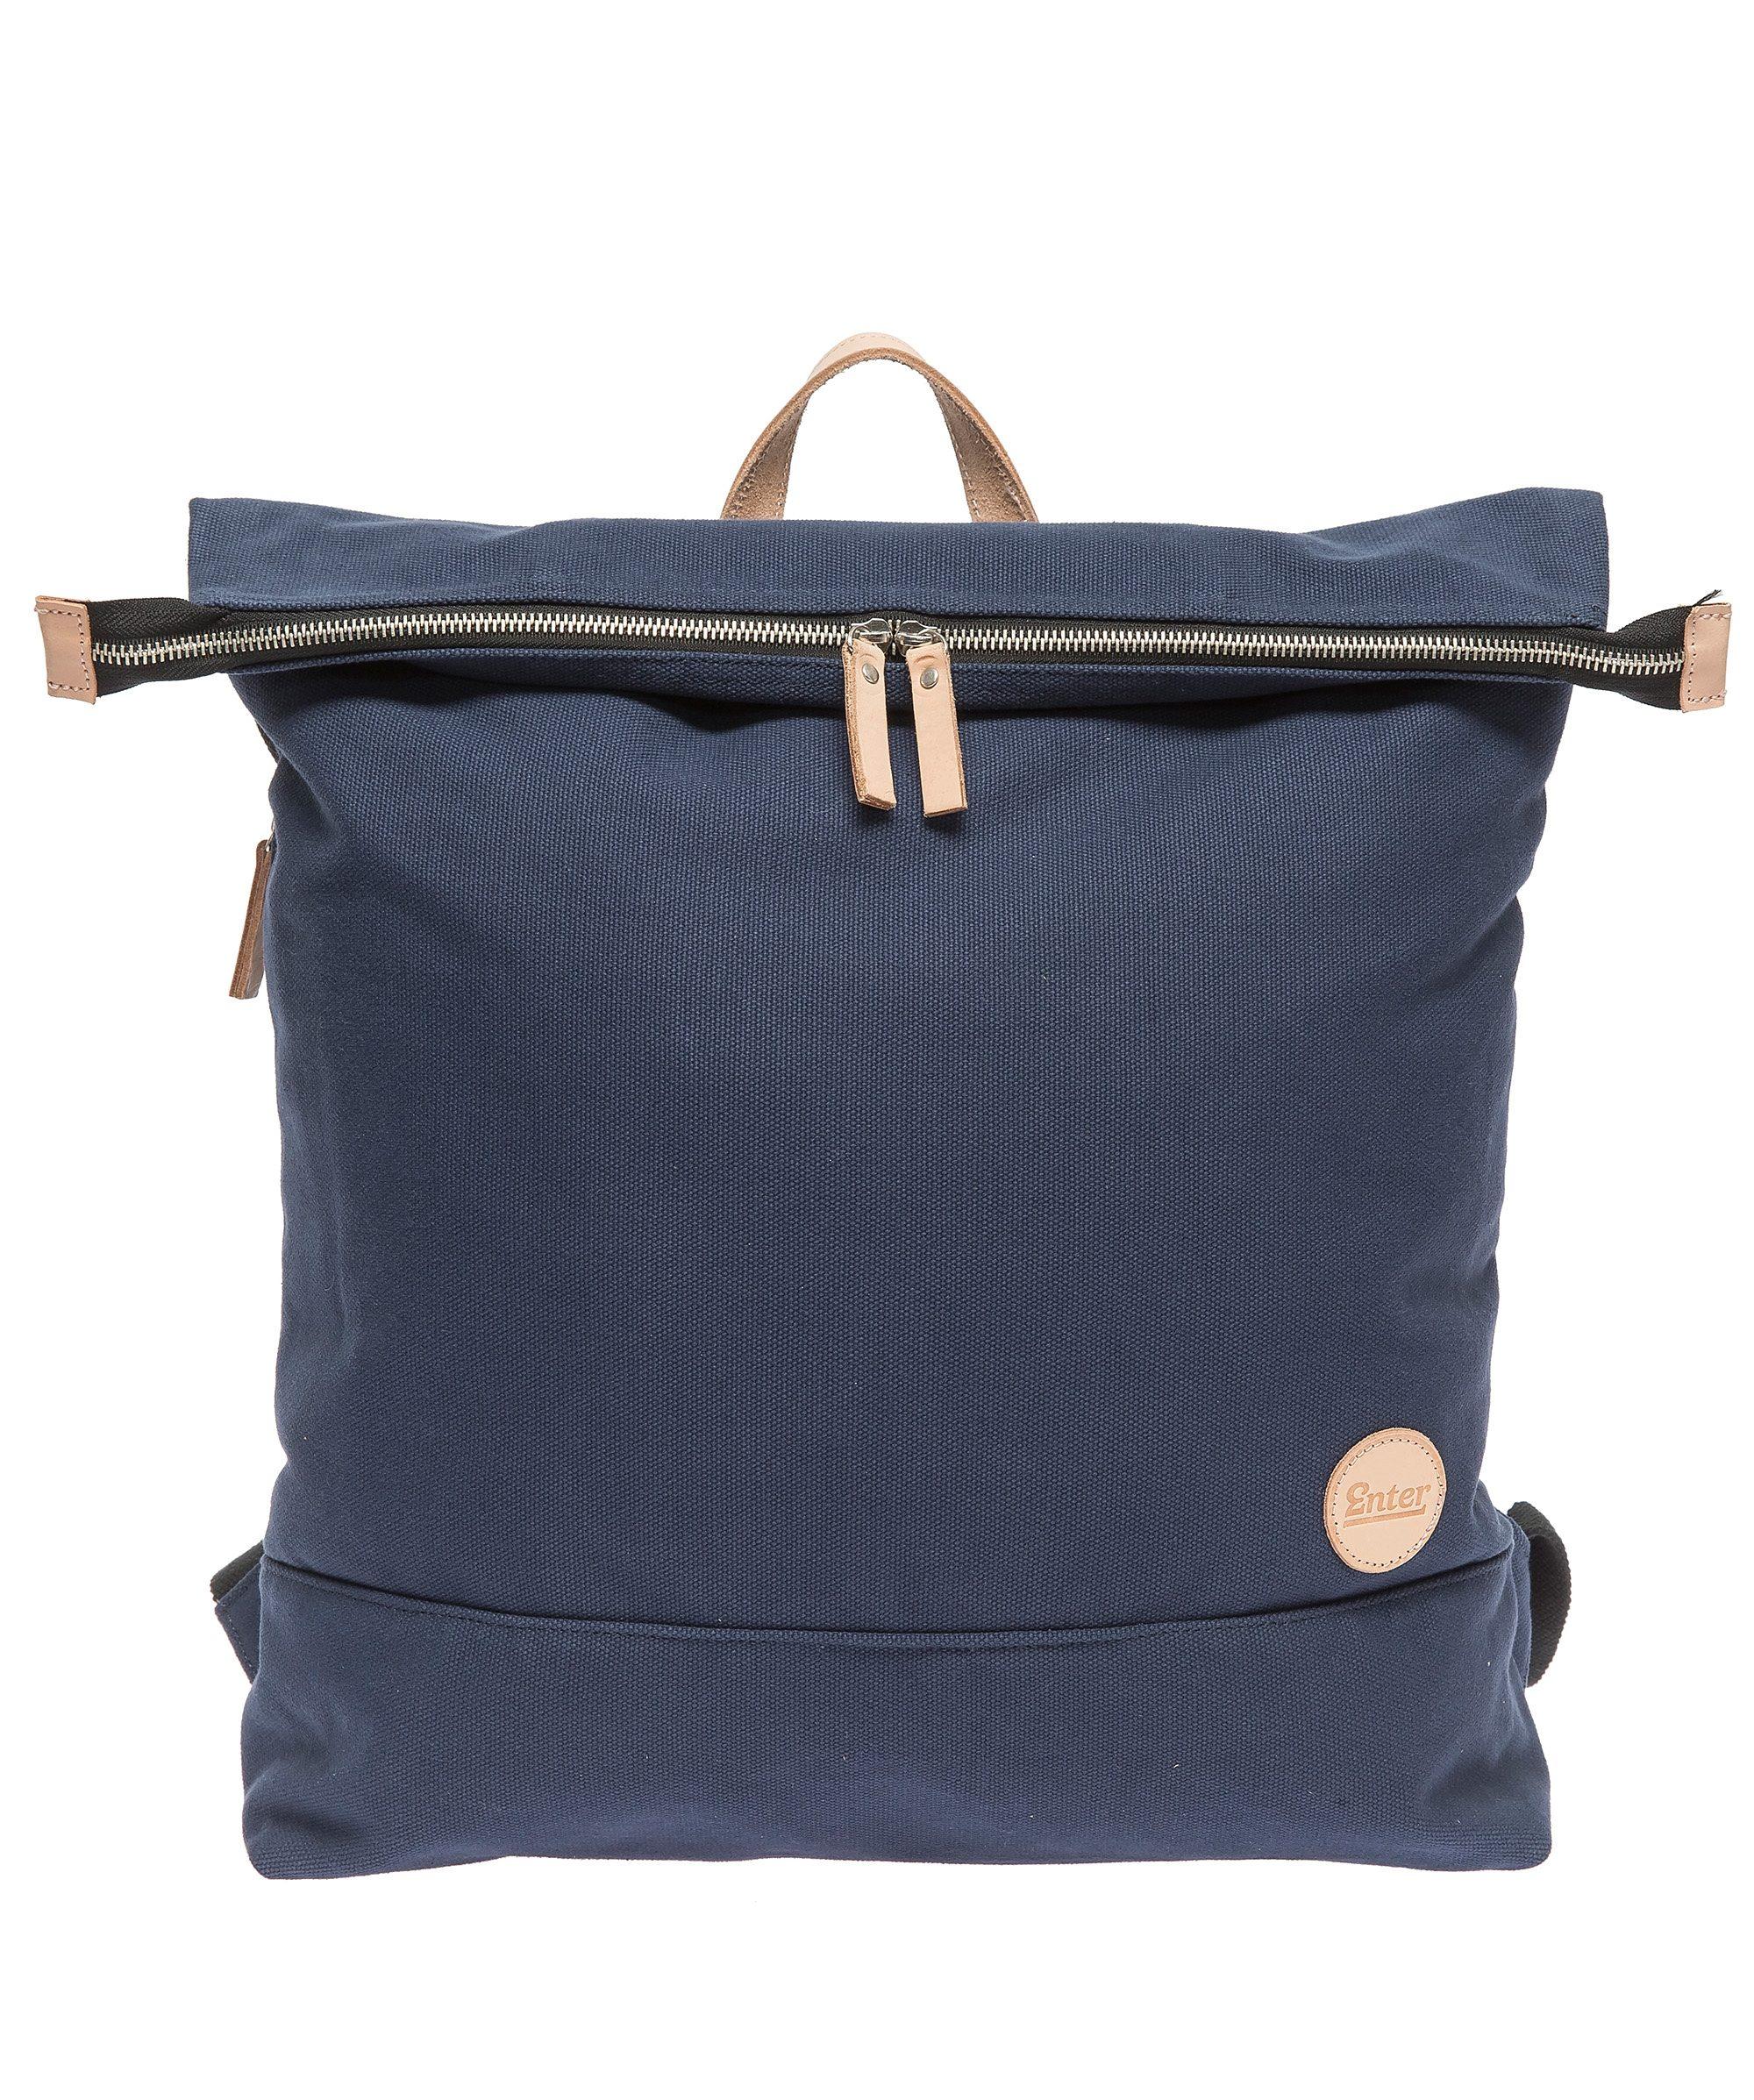 Enter Rucksack mit Laptop-Trennwand, »Top Zip Backpack, Navy/Natural«